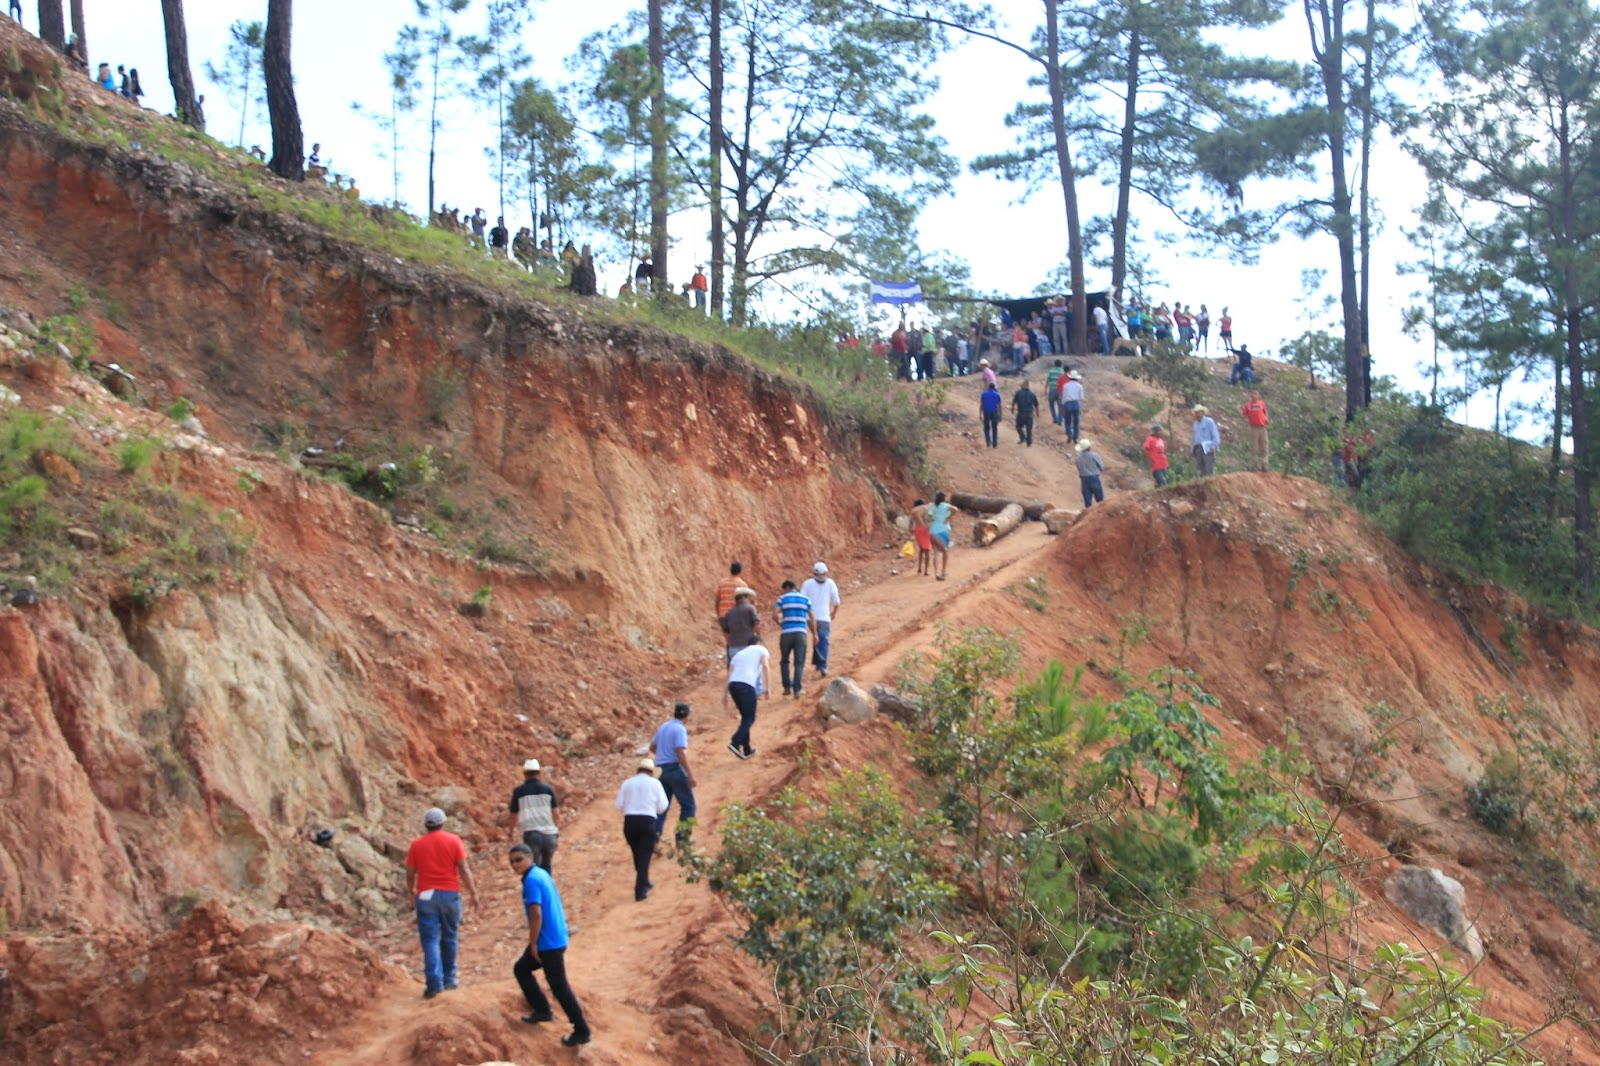 Photo caption: Climbing up to the community blockade, La Unión, Copan.